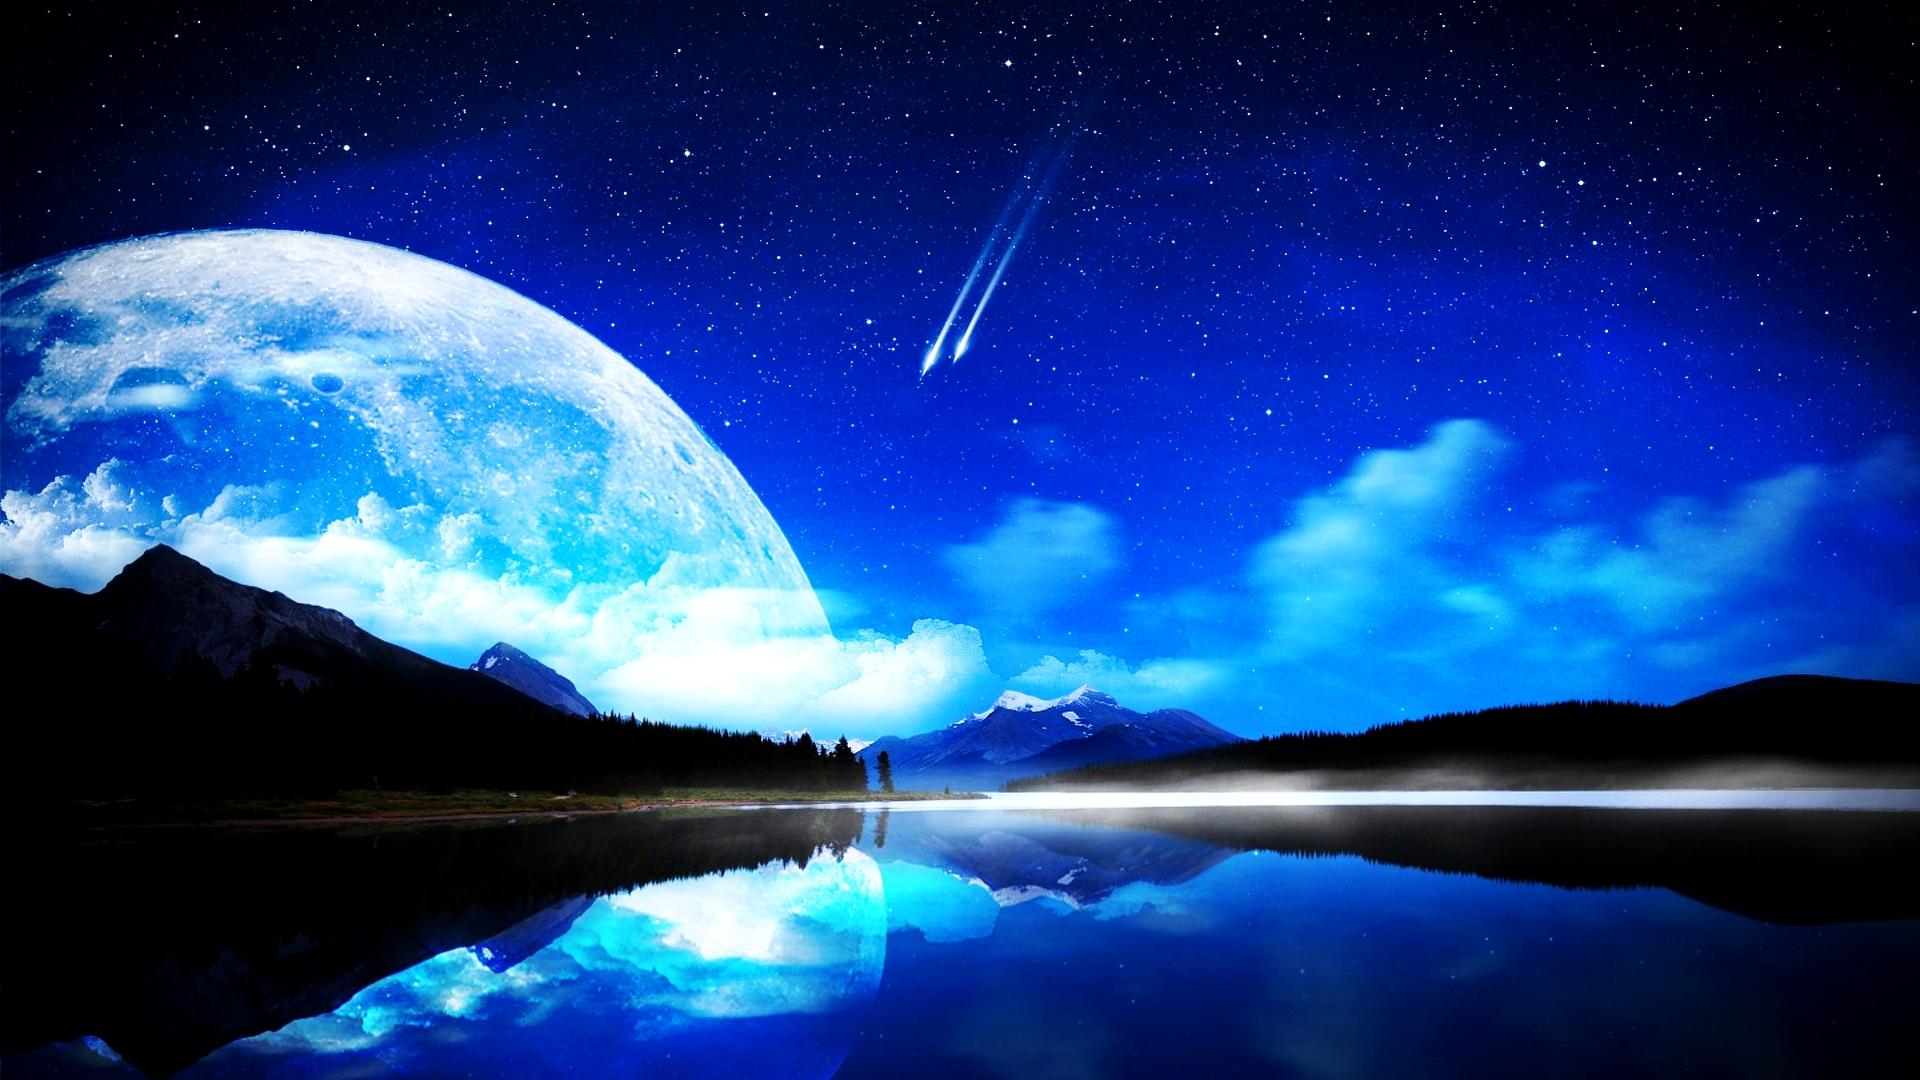 the blue moon hd wallpapers | pixelstalk